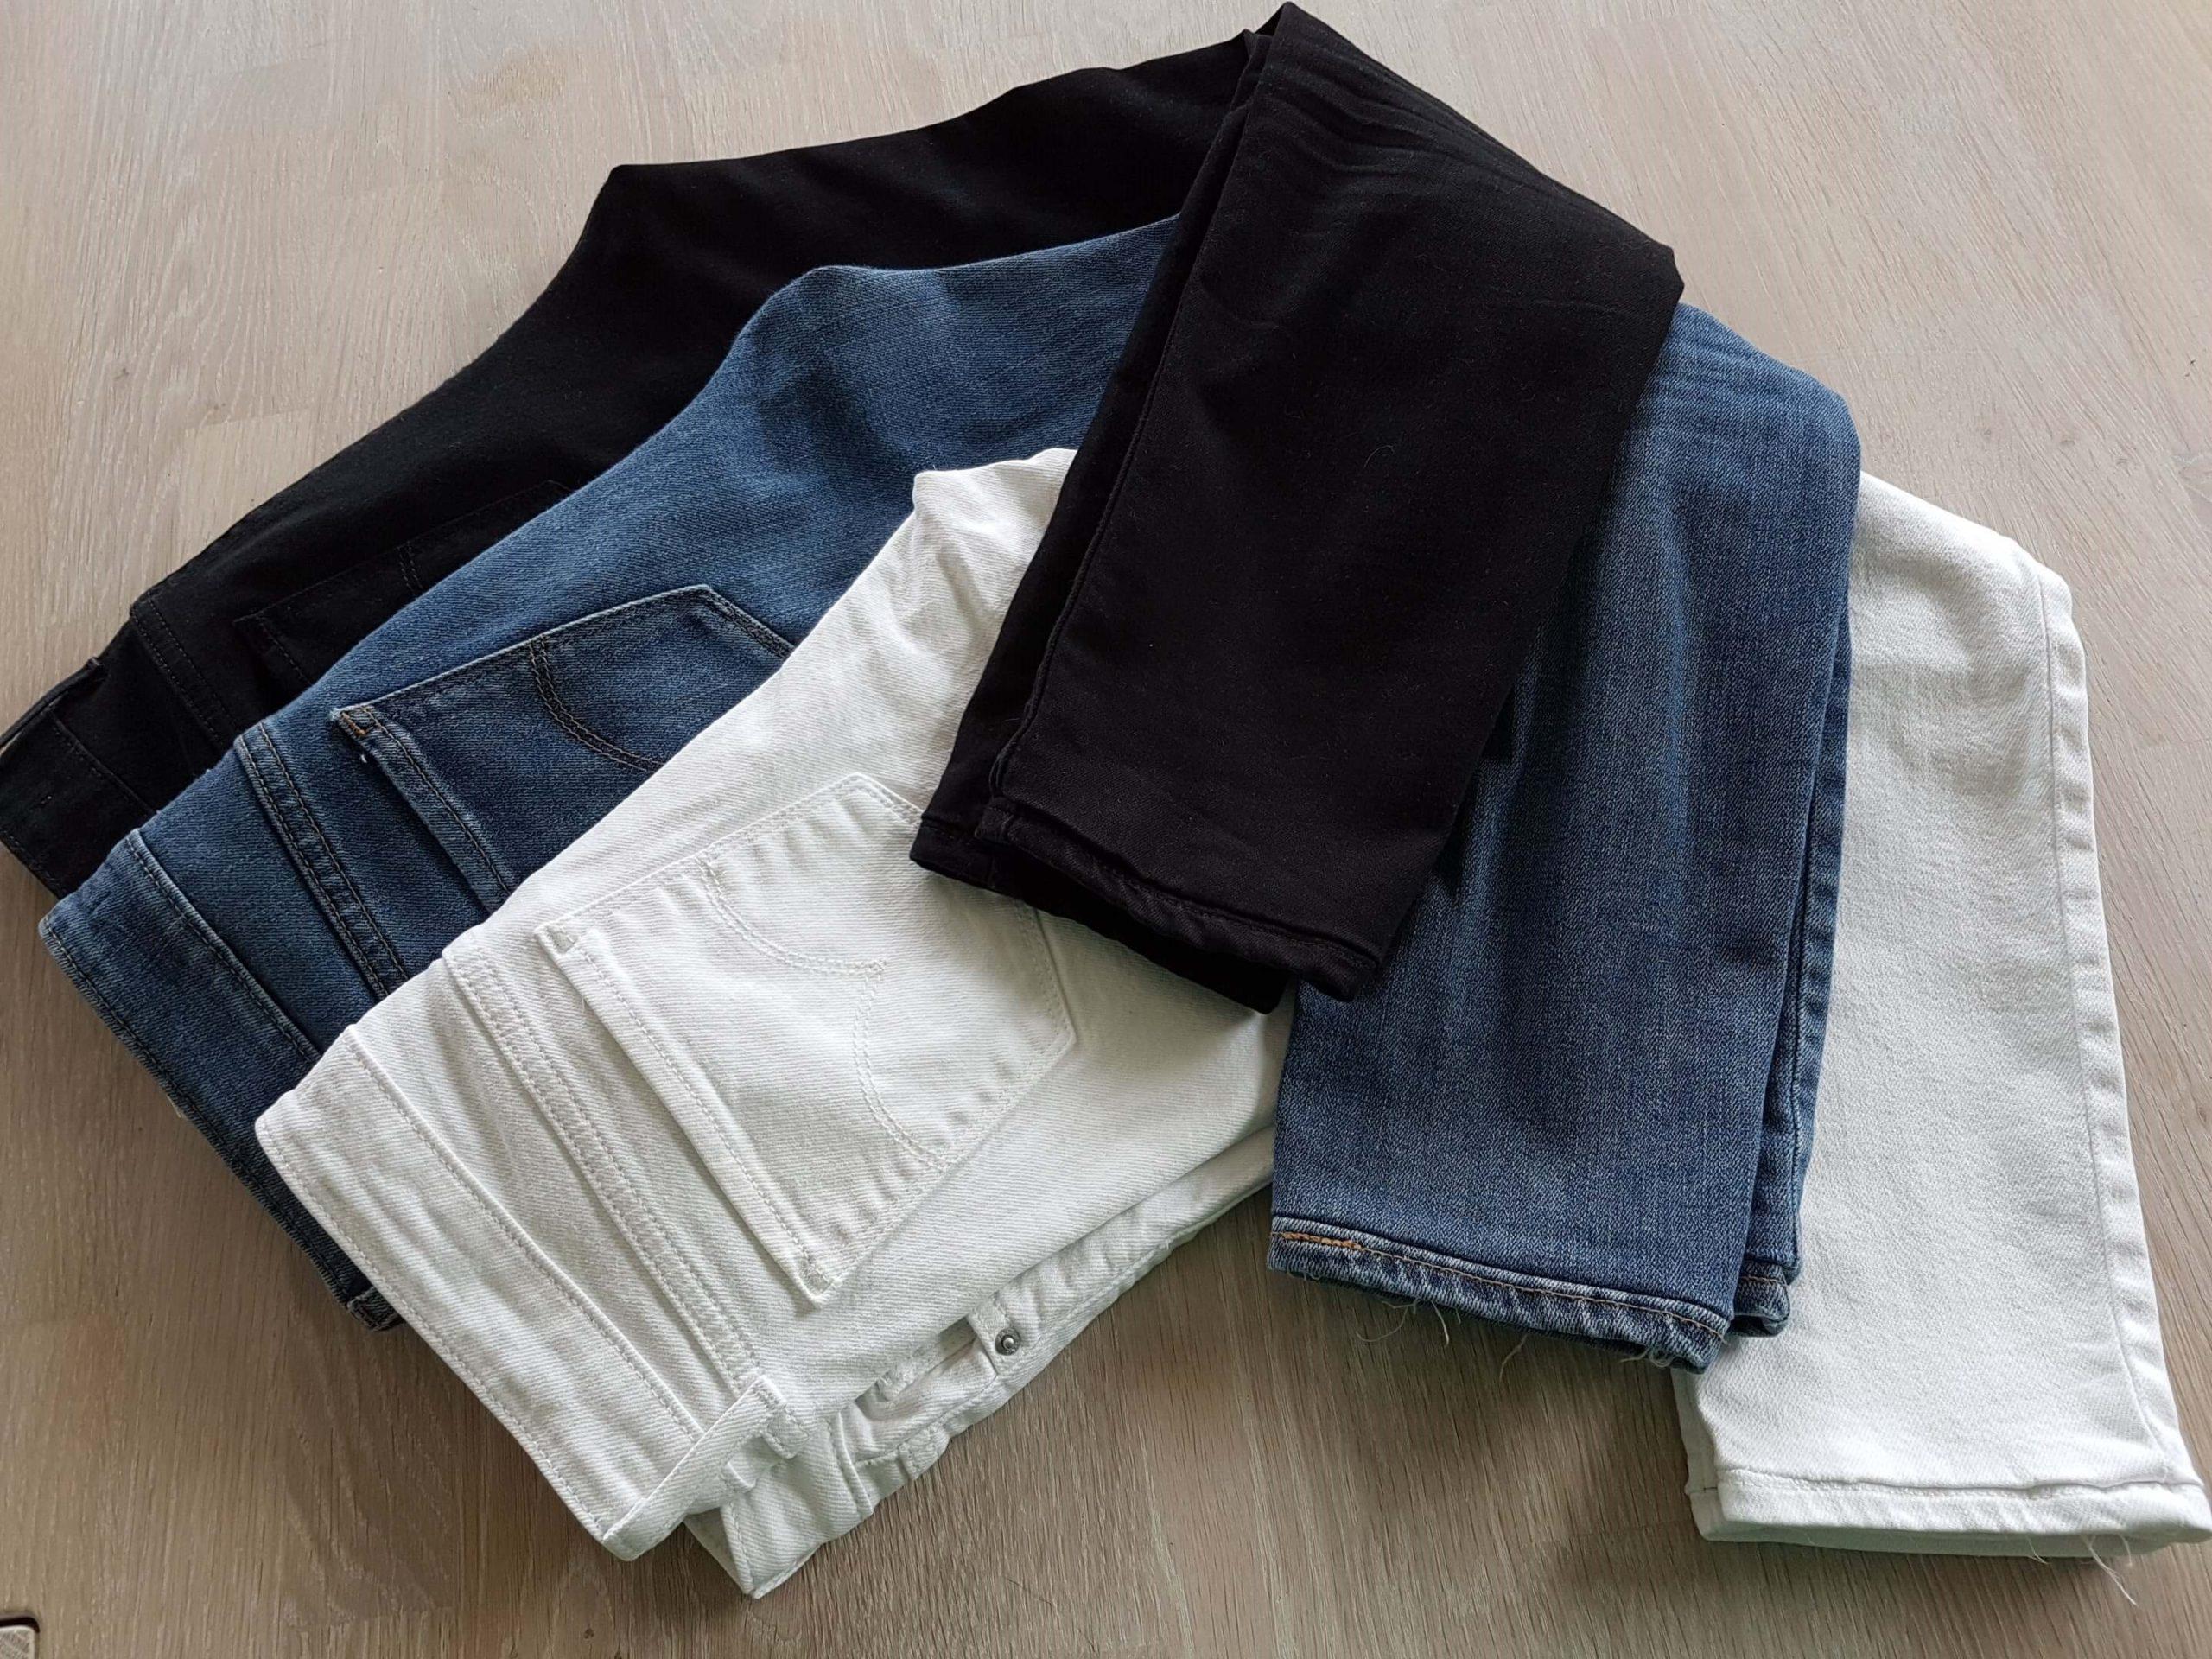 jeans oplægning kapsel garderobe